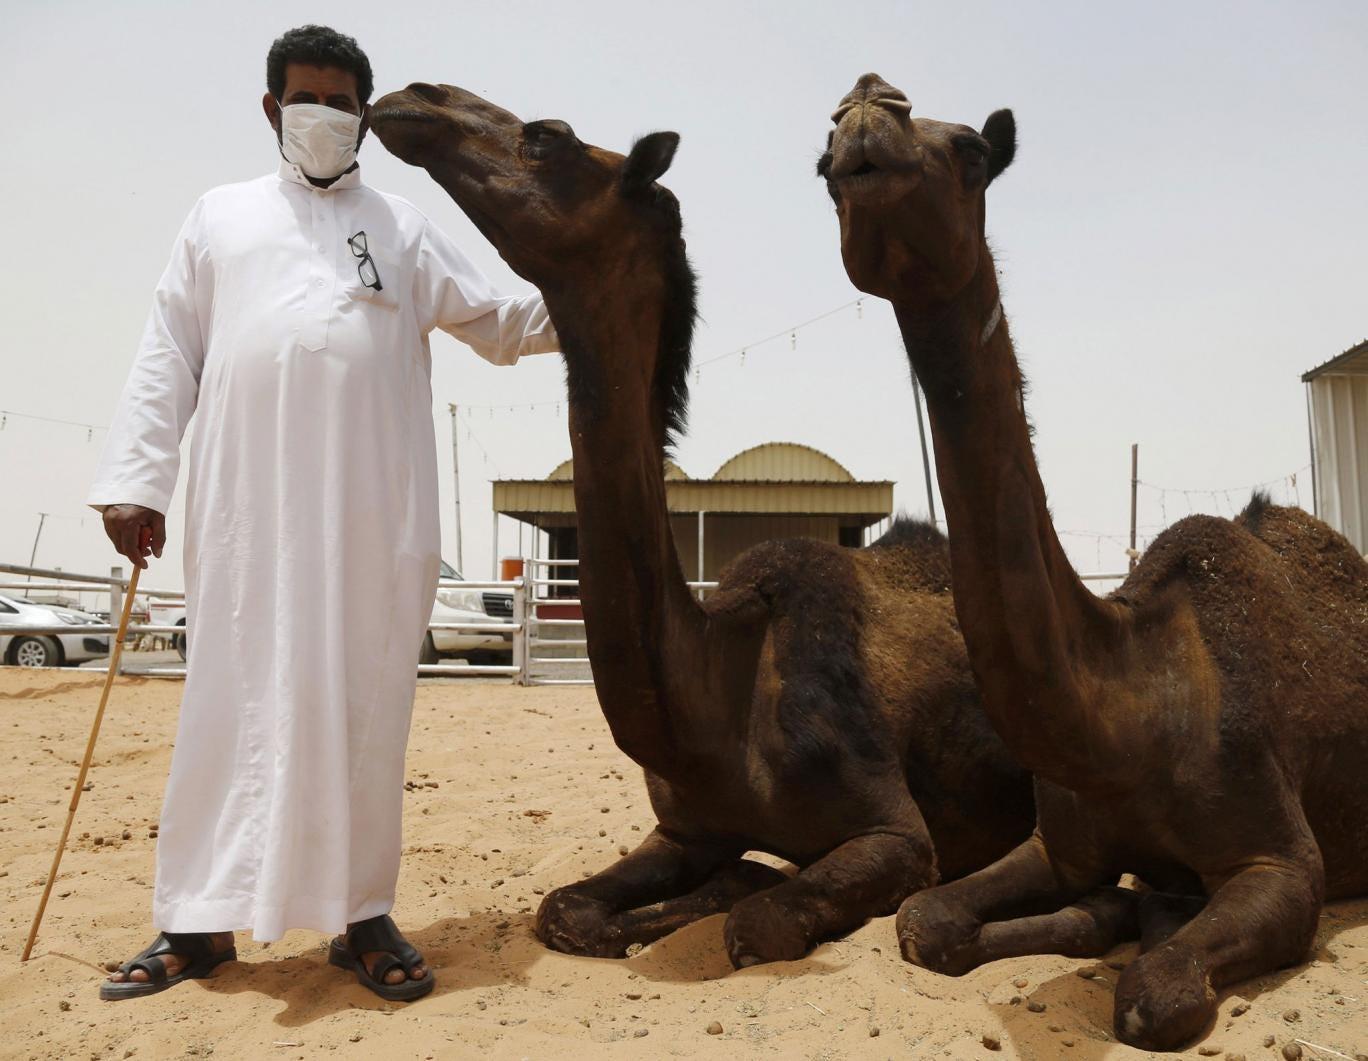 A man wearing a mask at a camel market in the village of al-Thamama near Riyadh on 11 May, 2014